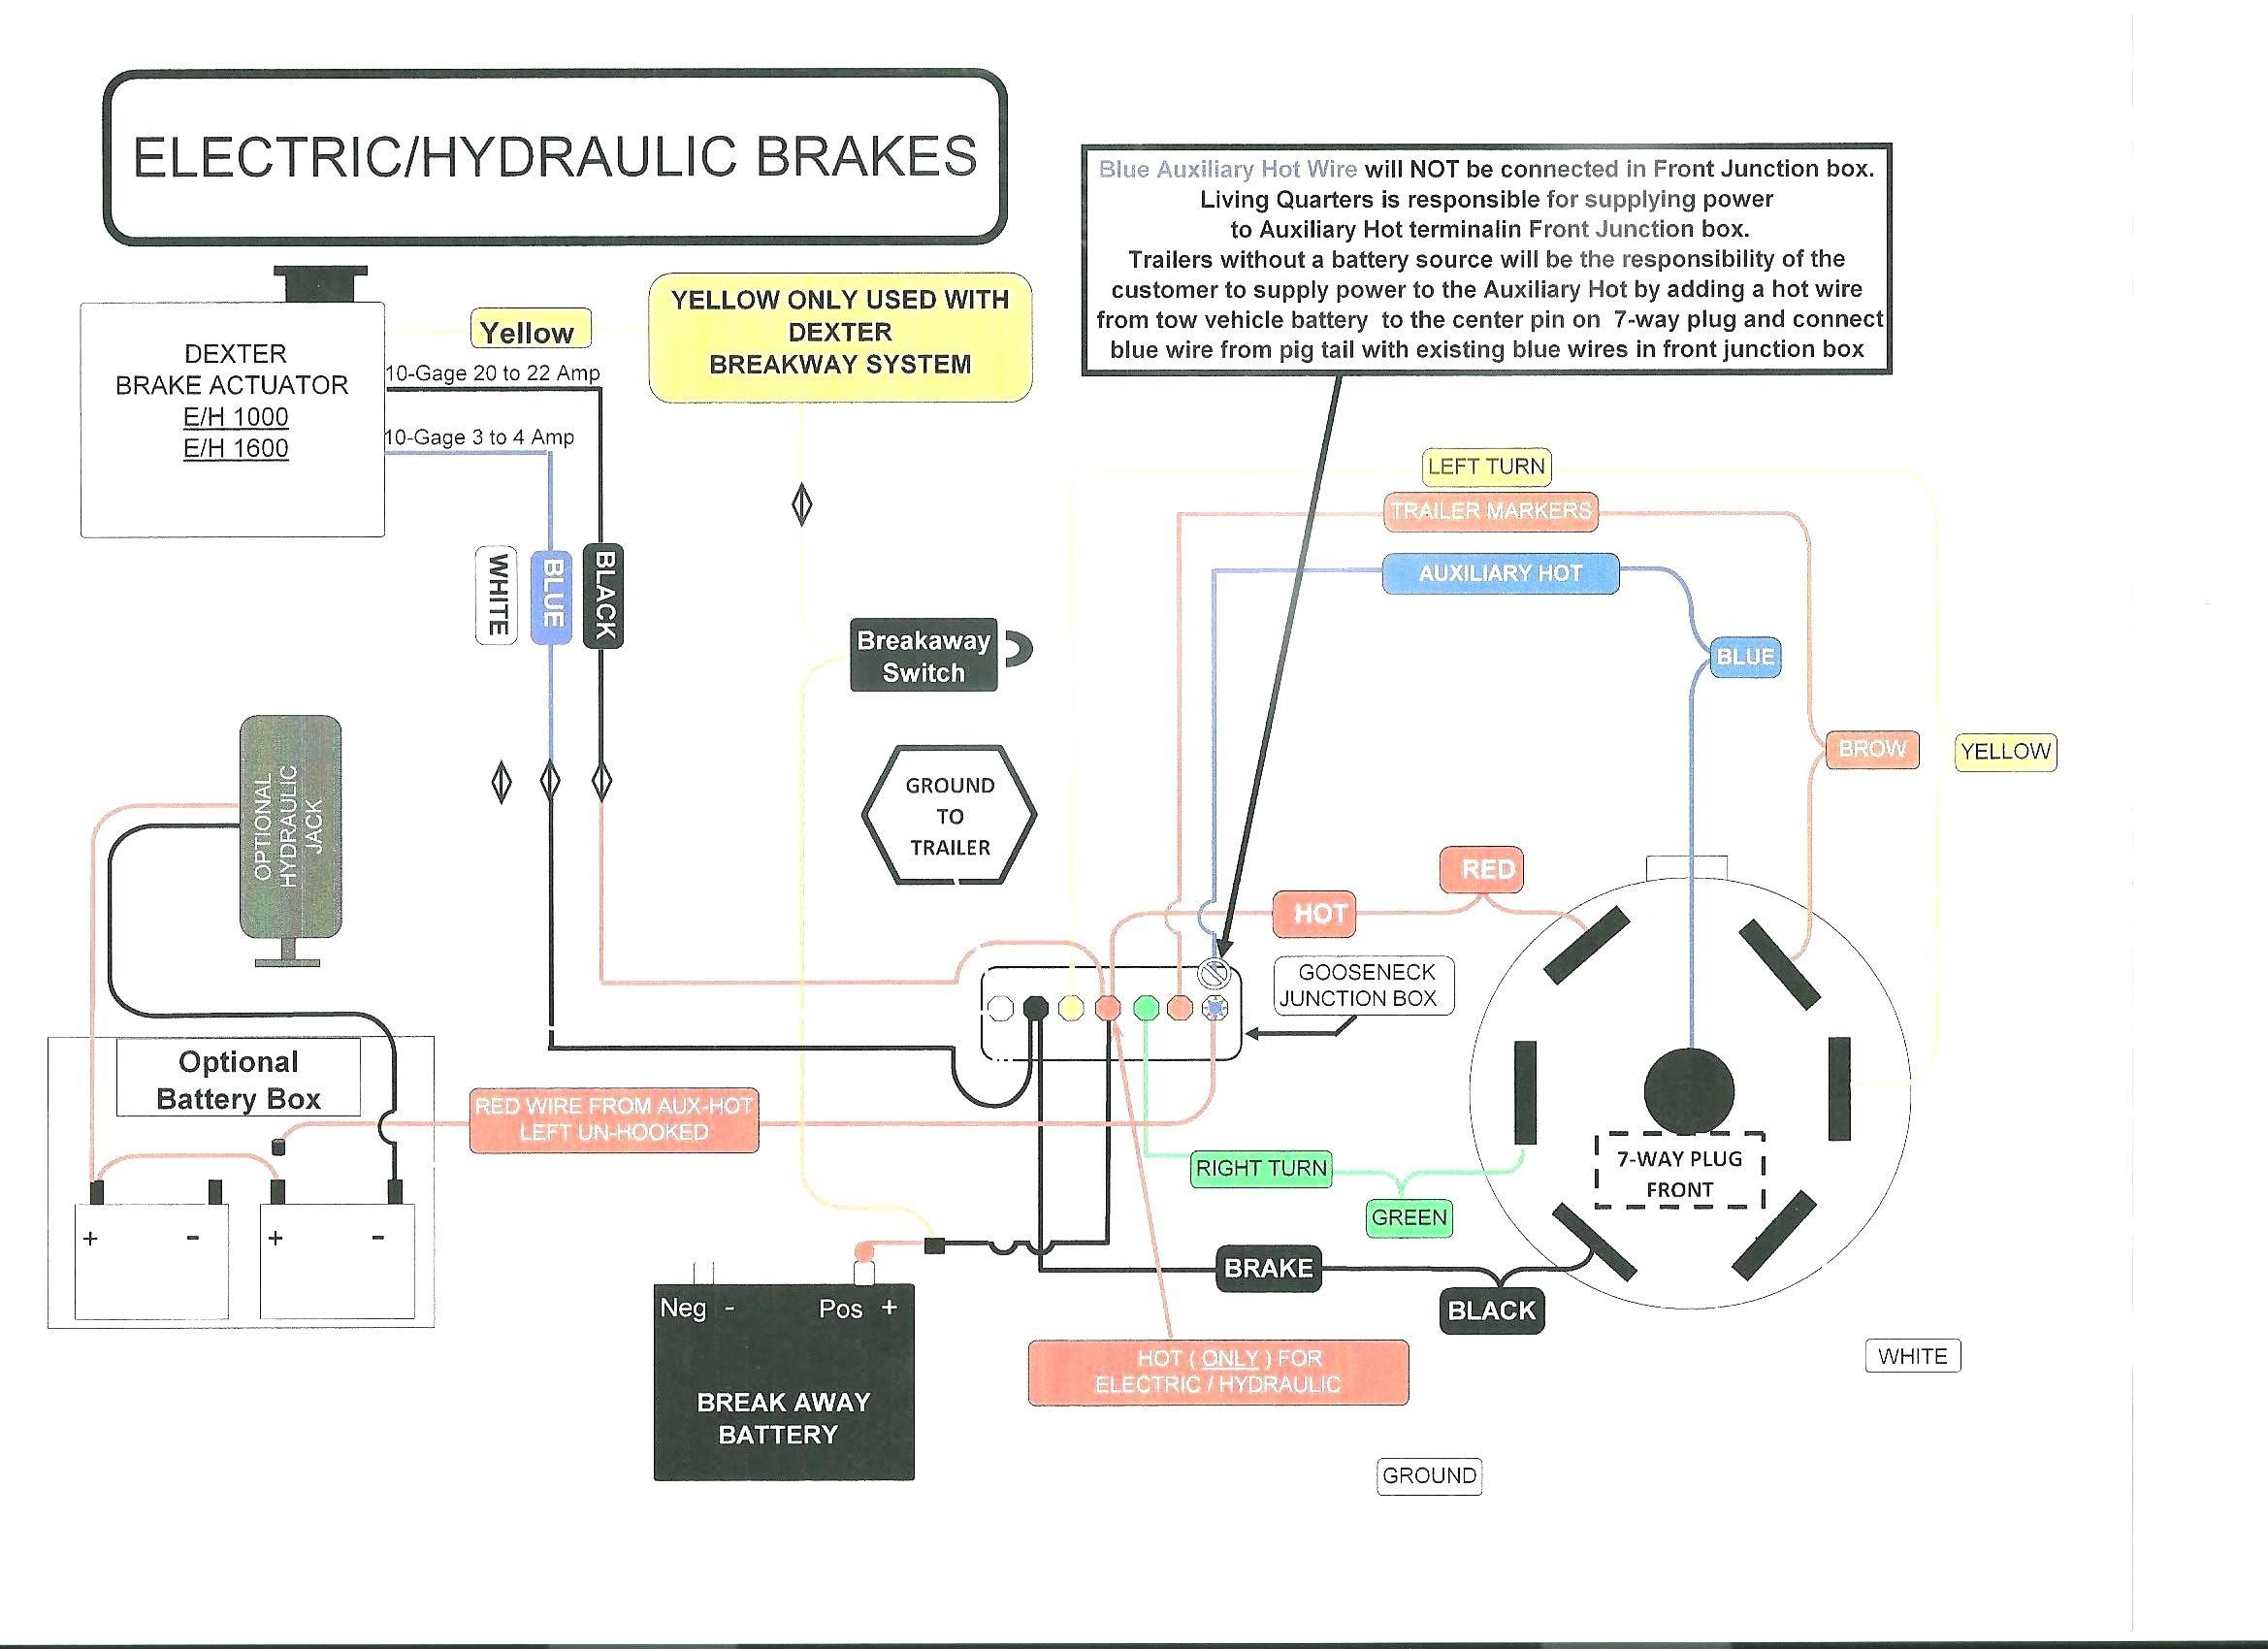 [DIAGRAM_38IU]  XE_2986] Peterson Plow Light Wiring Diagram | Peterson Trailer Wiring Diagram |  | Nnigh Benkeme Mohammedshrine Librar Wiring 101